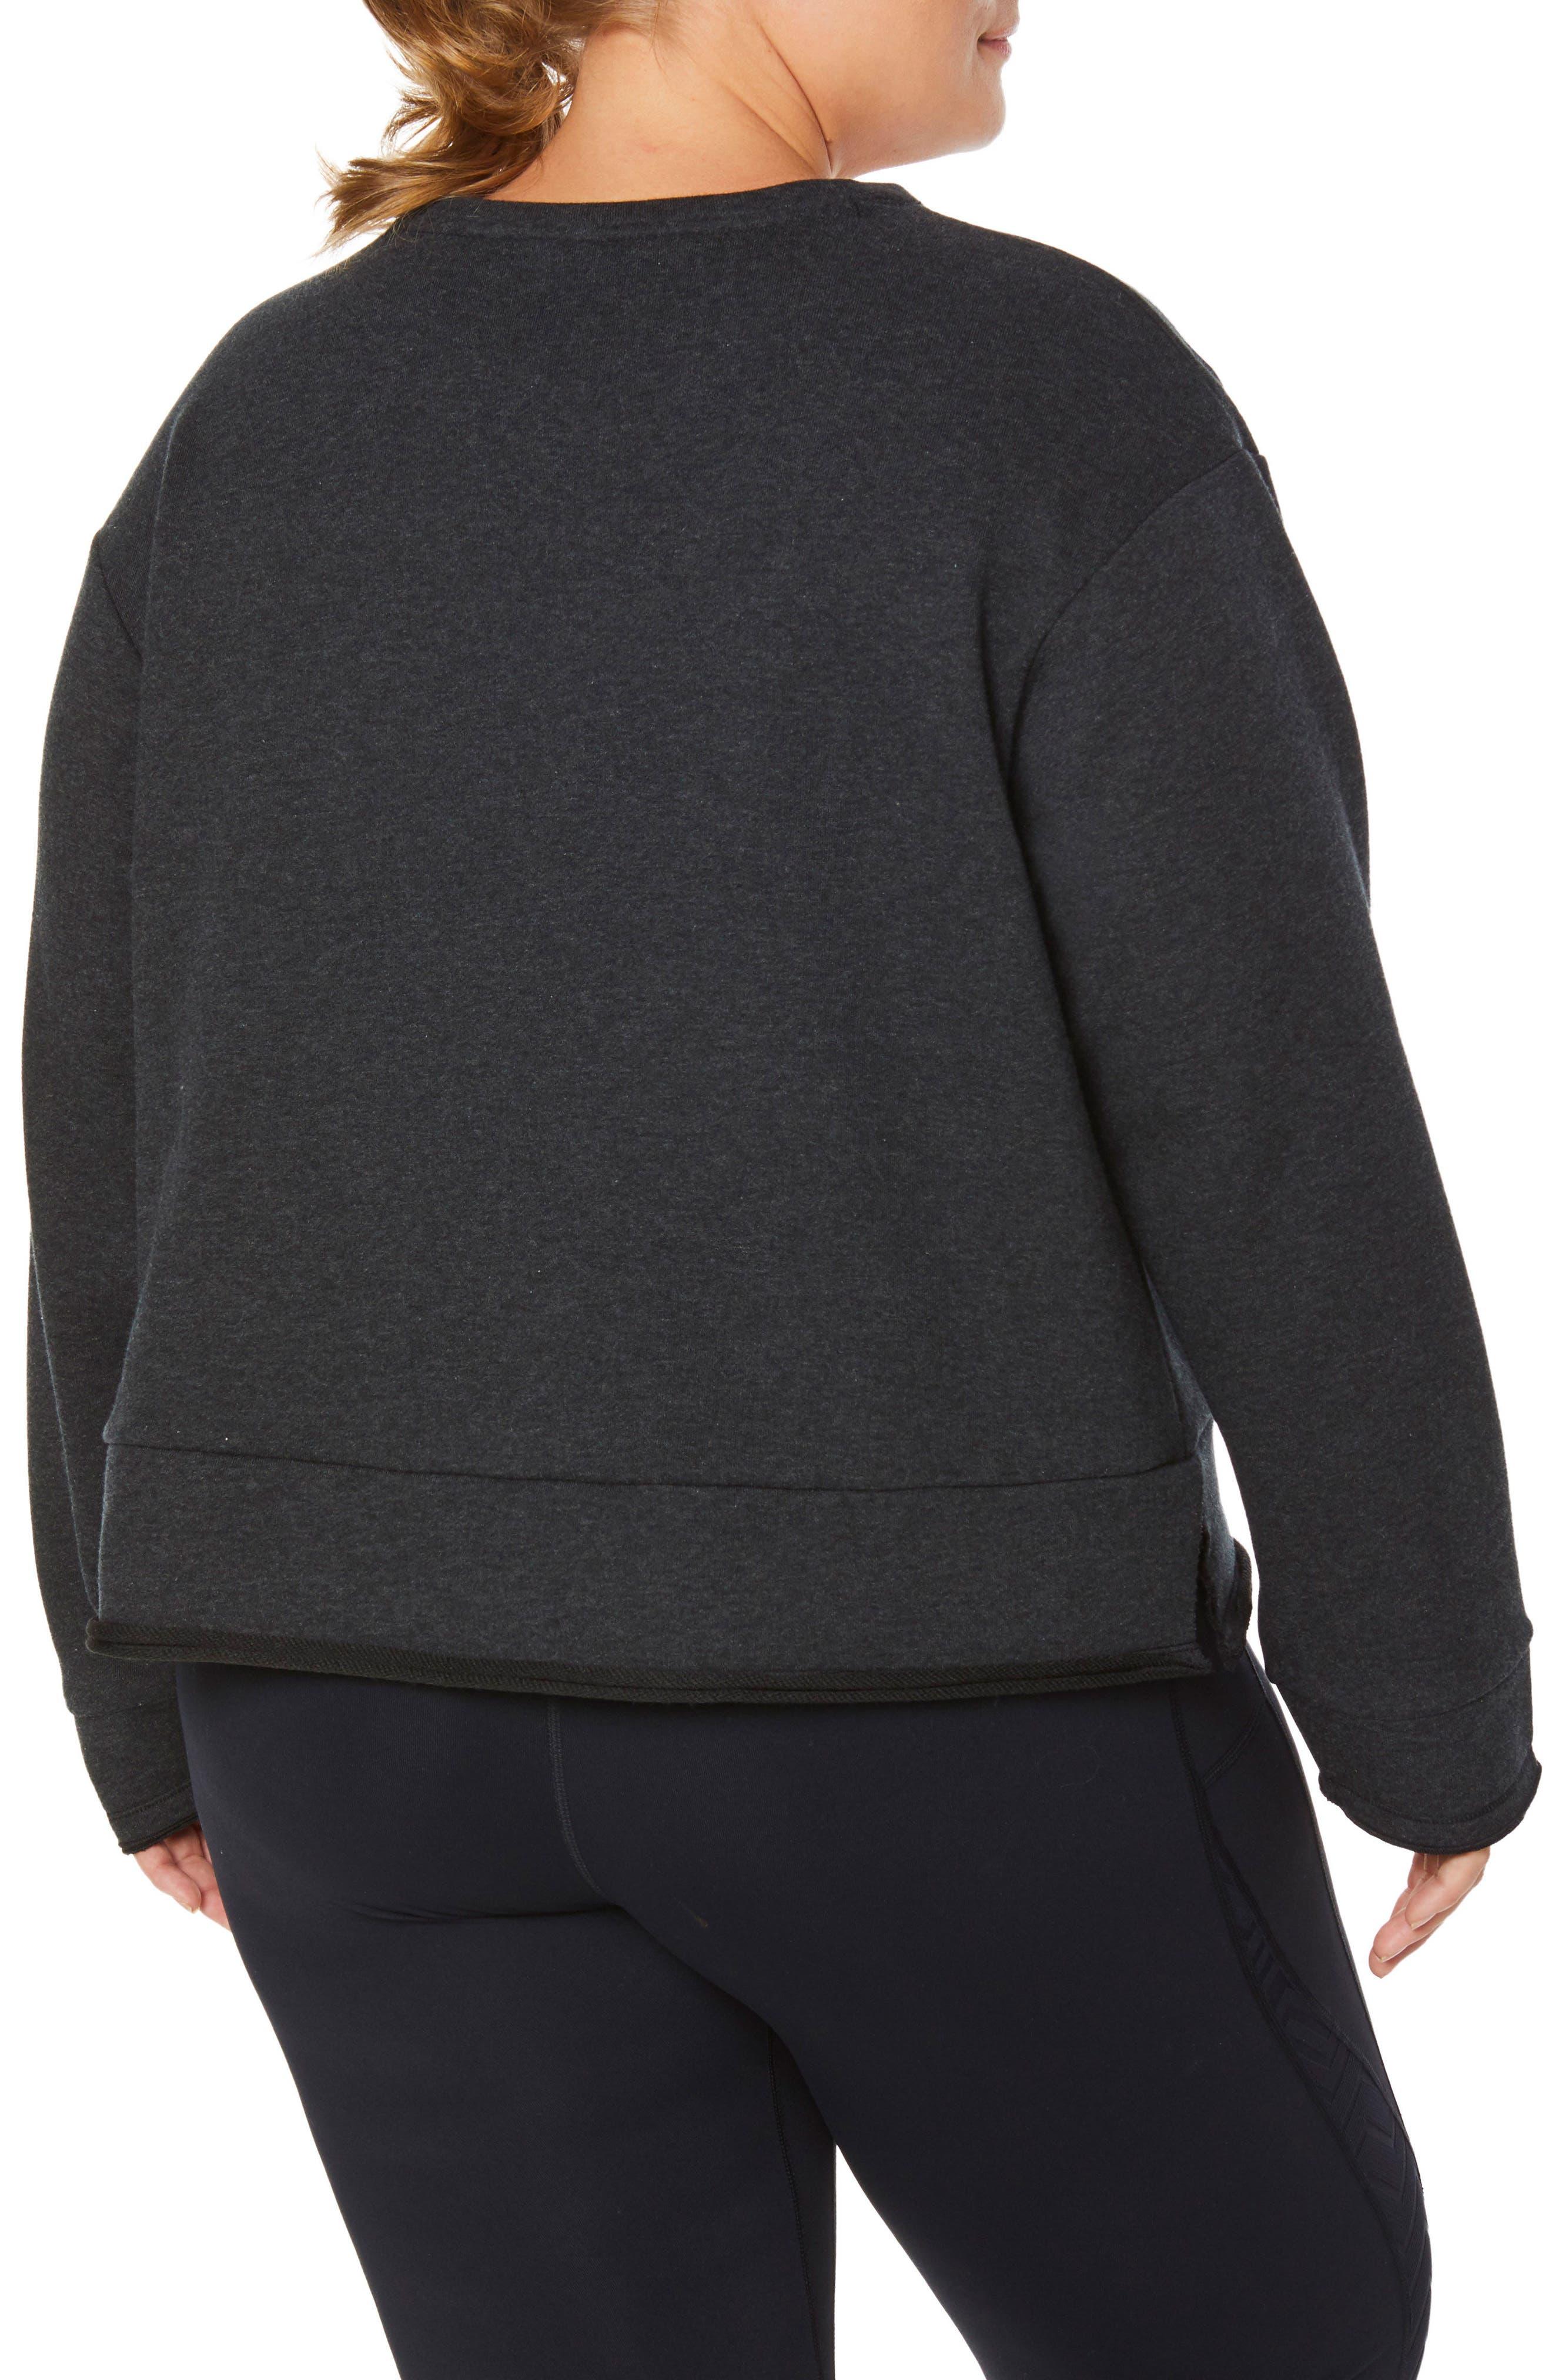 Shape Extended Day Sweatshirt,                             Alternate thumbnail 2, color,                             CHARCOAL BLACK